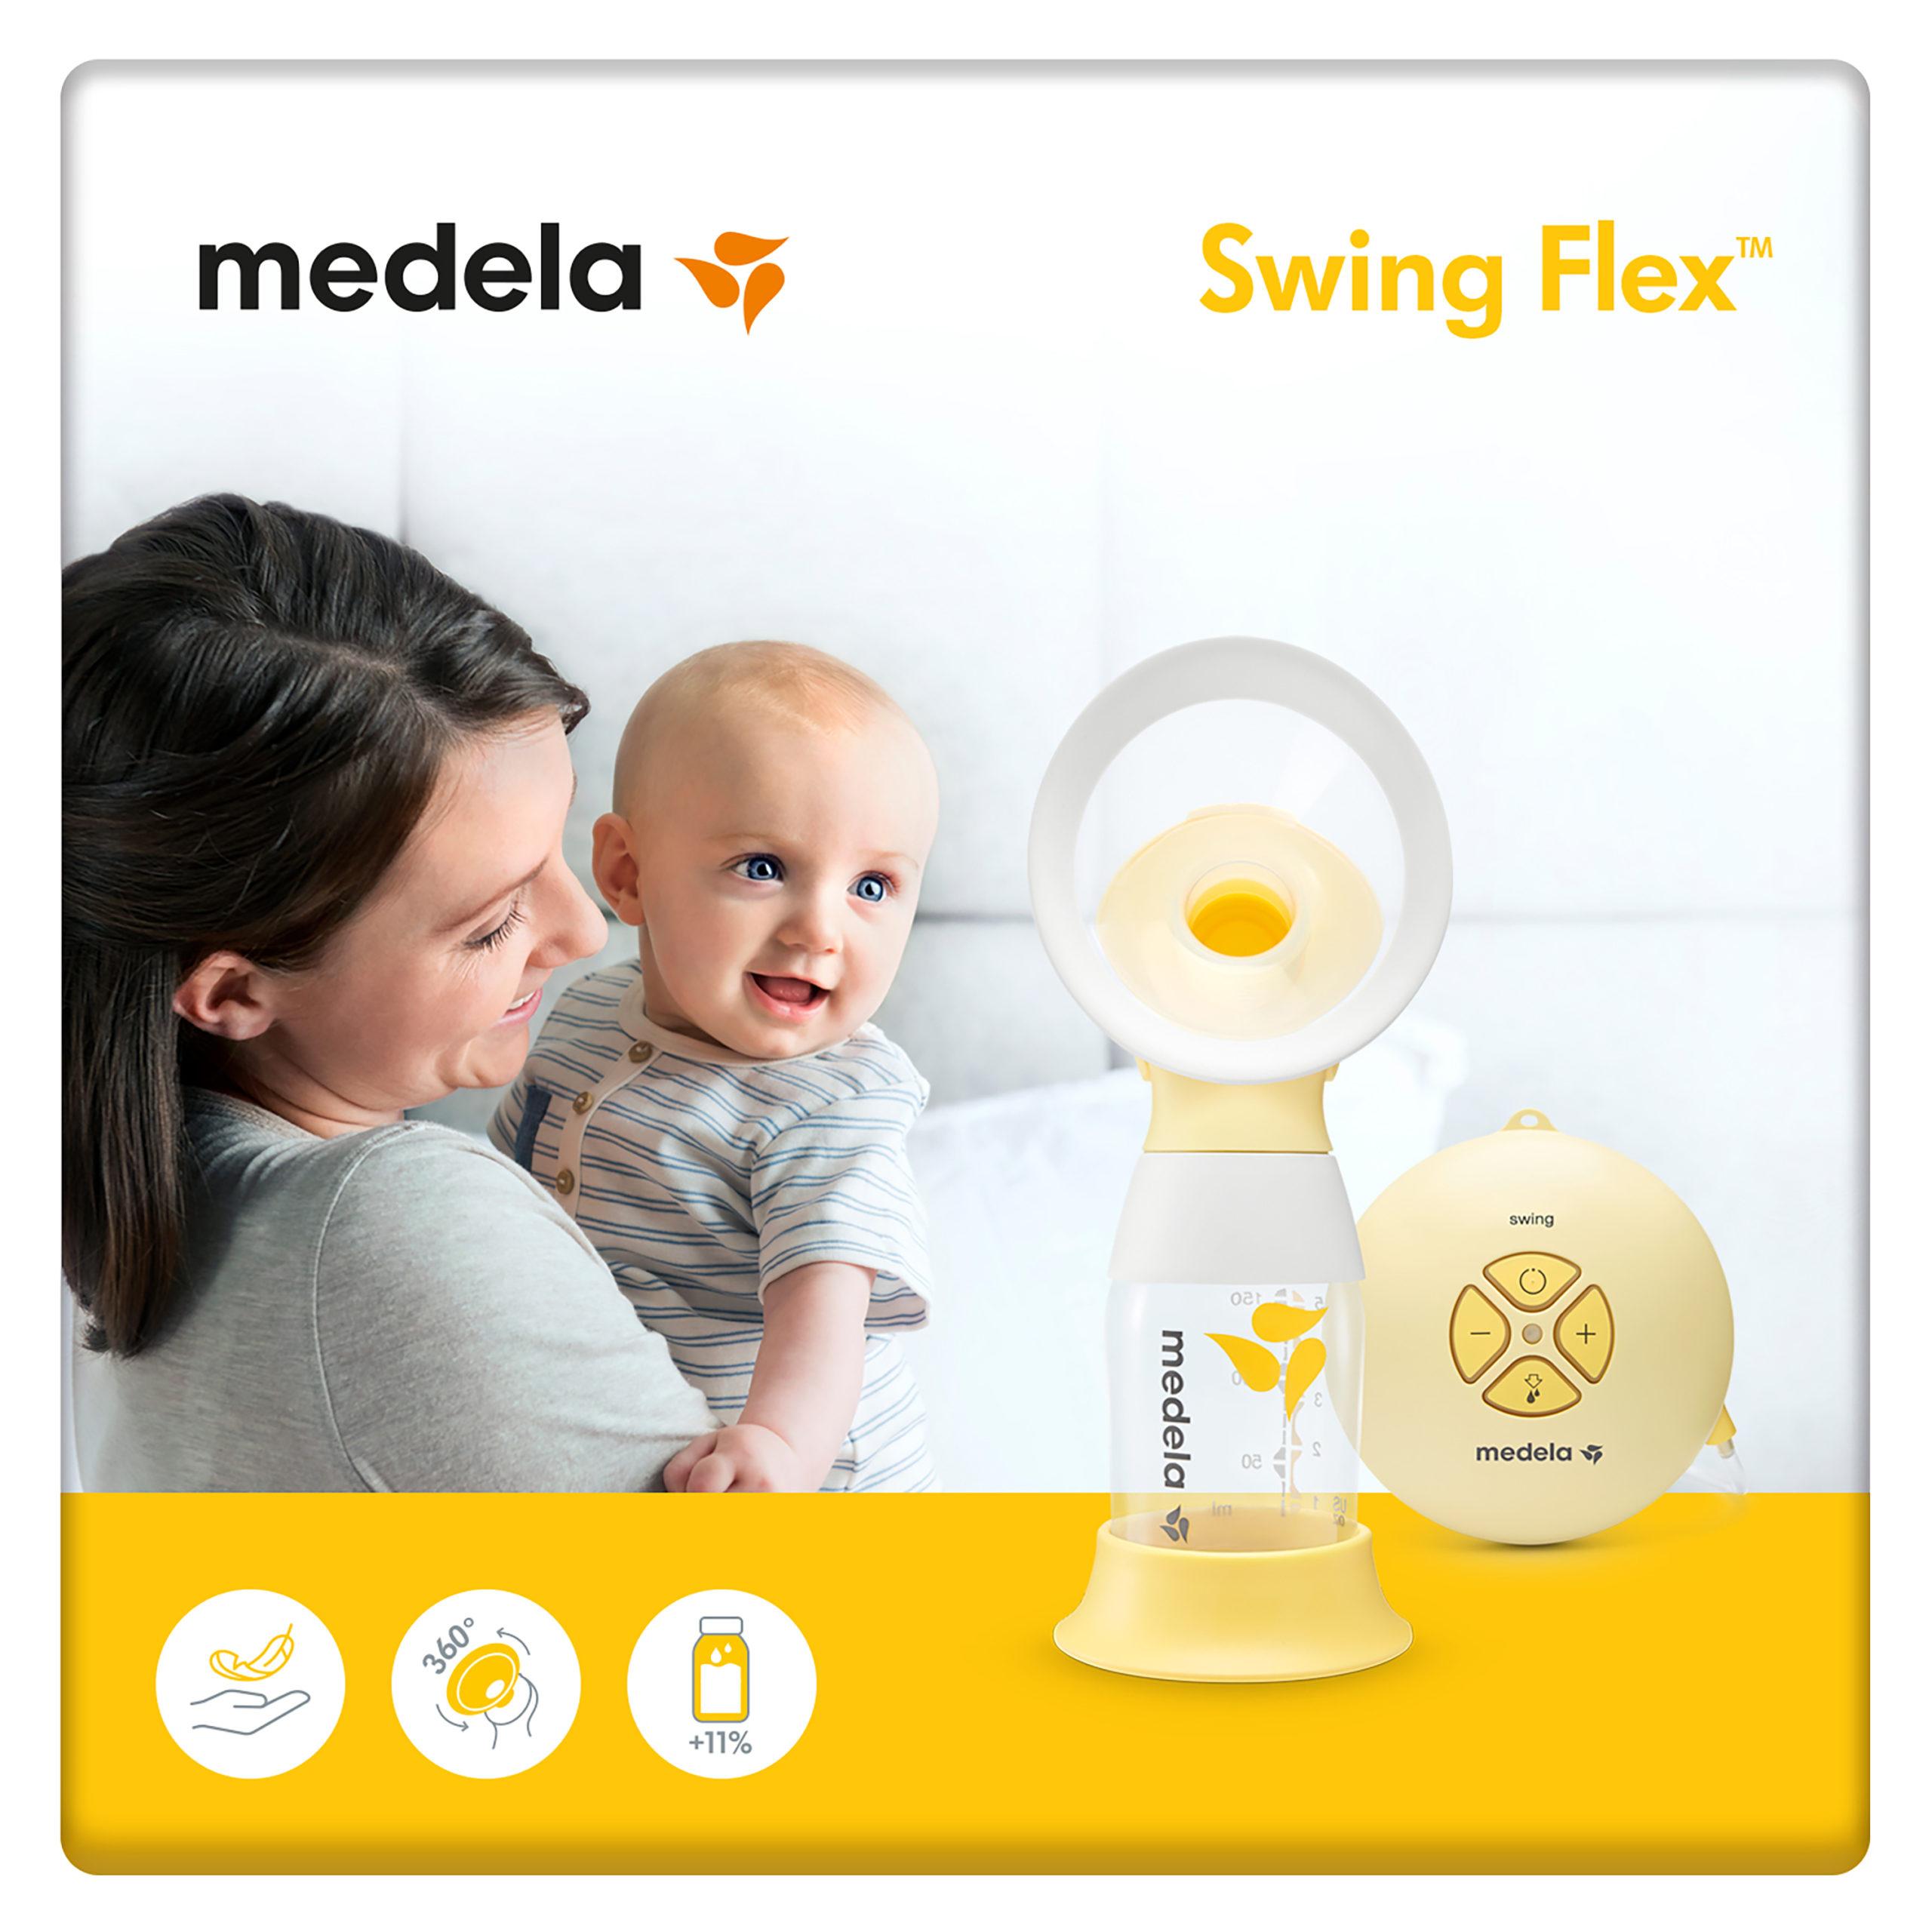 Swing Flex Breast Pump Single Electric Breast Pump Medela